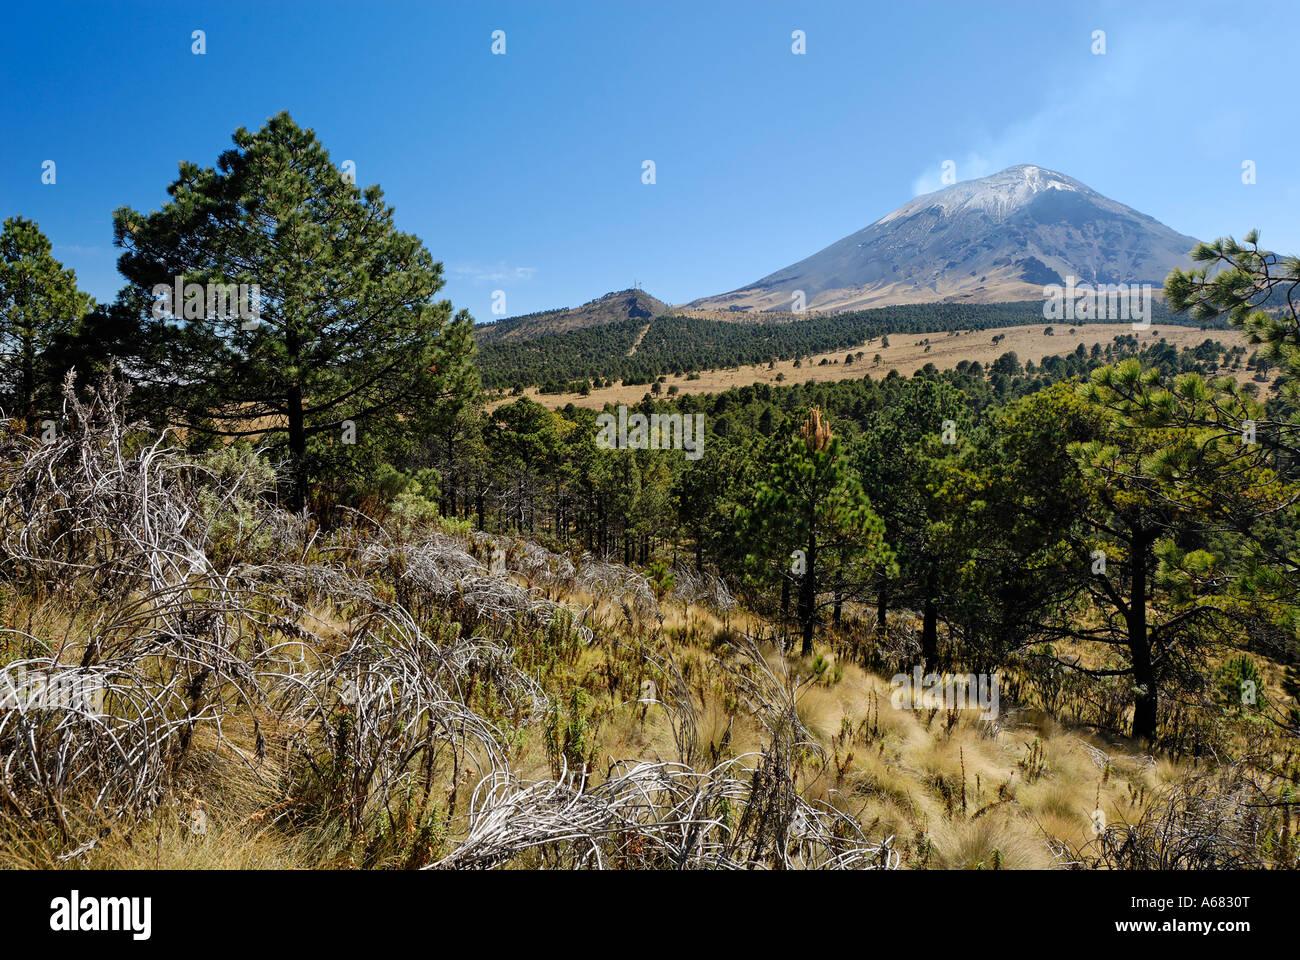 Smoking Popocatepetl volcanoe, Popocatepetl-Iztaccihuatl National Park, Mexico Stock Photo